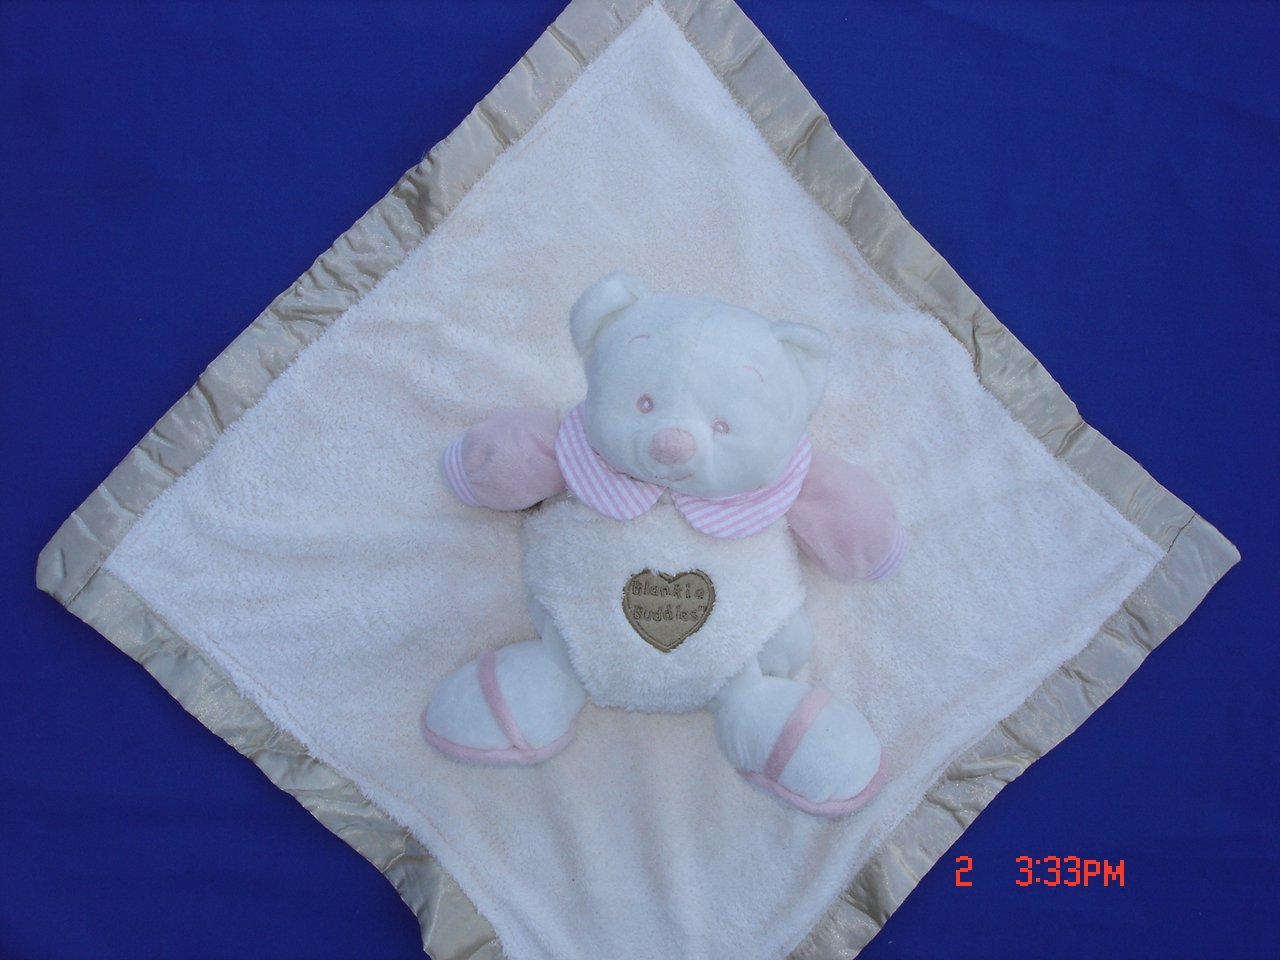 Ellis Baby Blankie Buddies Super Soft 2-in-1 Security Blanket Banky 18x18 Beige Blankie Lovie w/ 7 Tall Baby Pink Teddy Bear Rattle Toy by Ellis Baby Collection   B004BAAY06